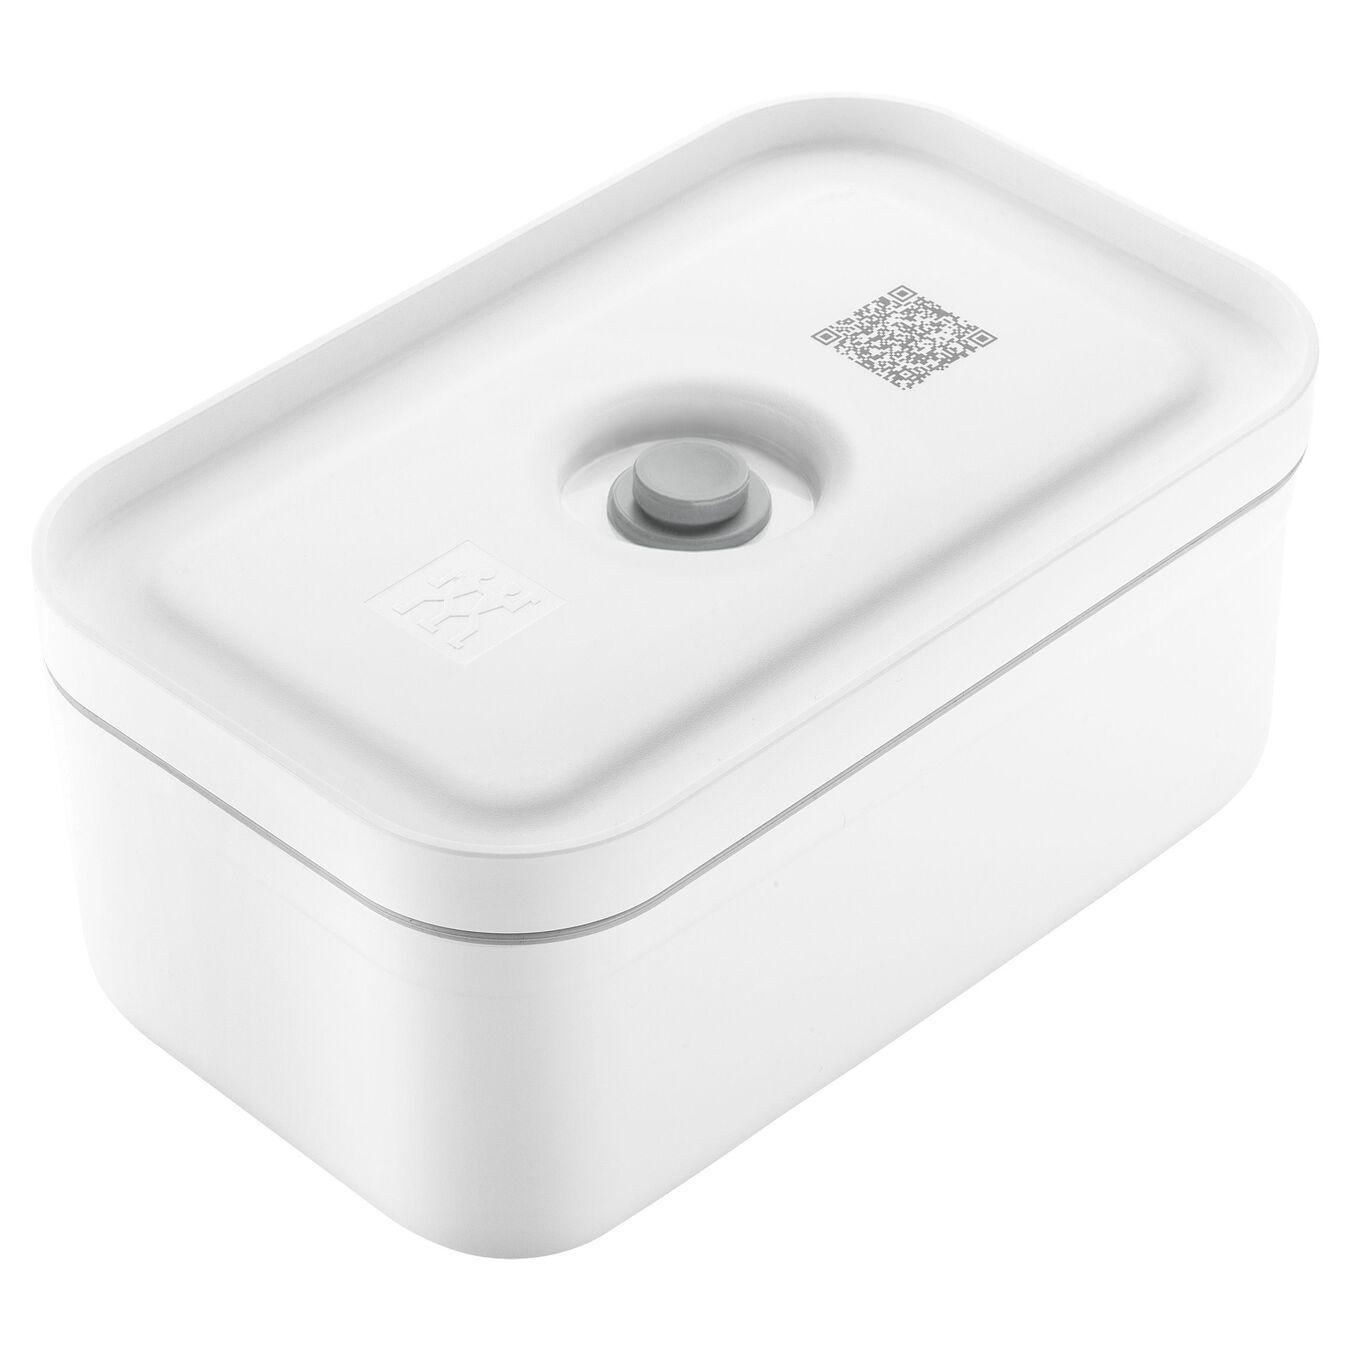 Vakuum Lunchbox, M, Kunststoff, Weiß,,large 1